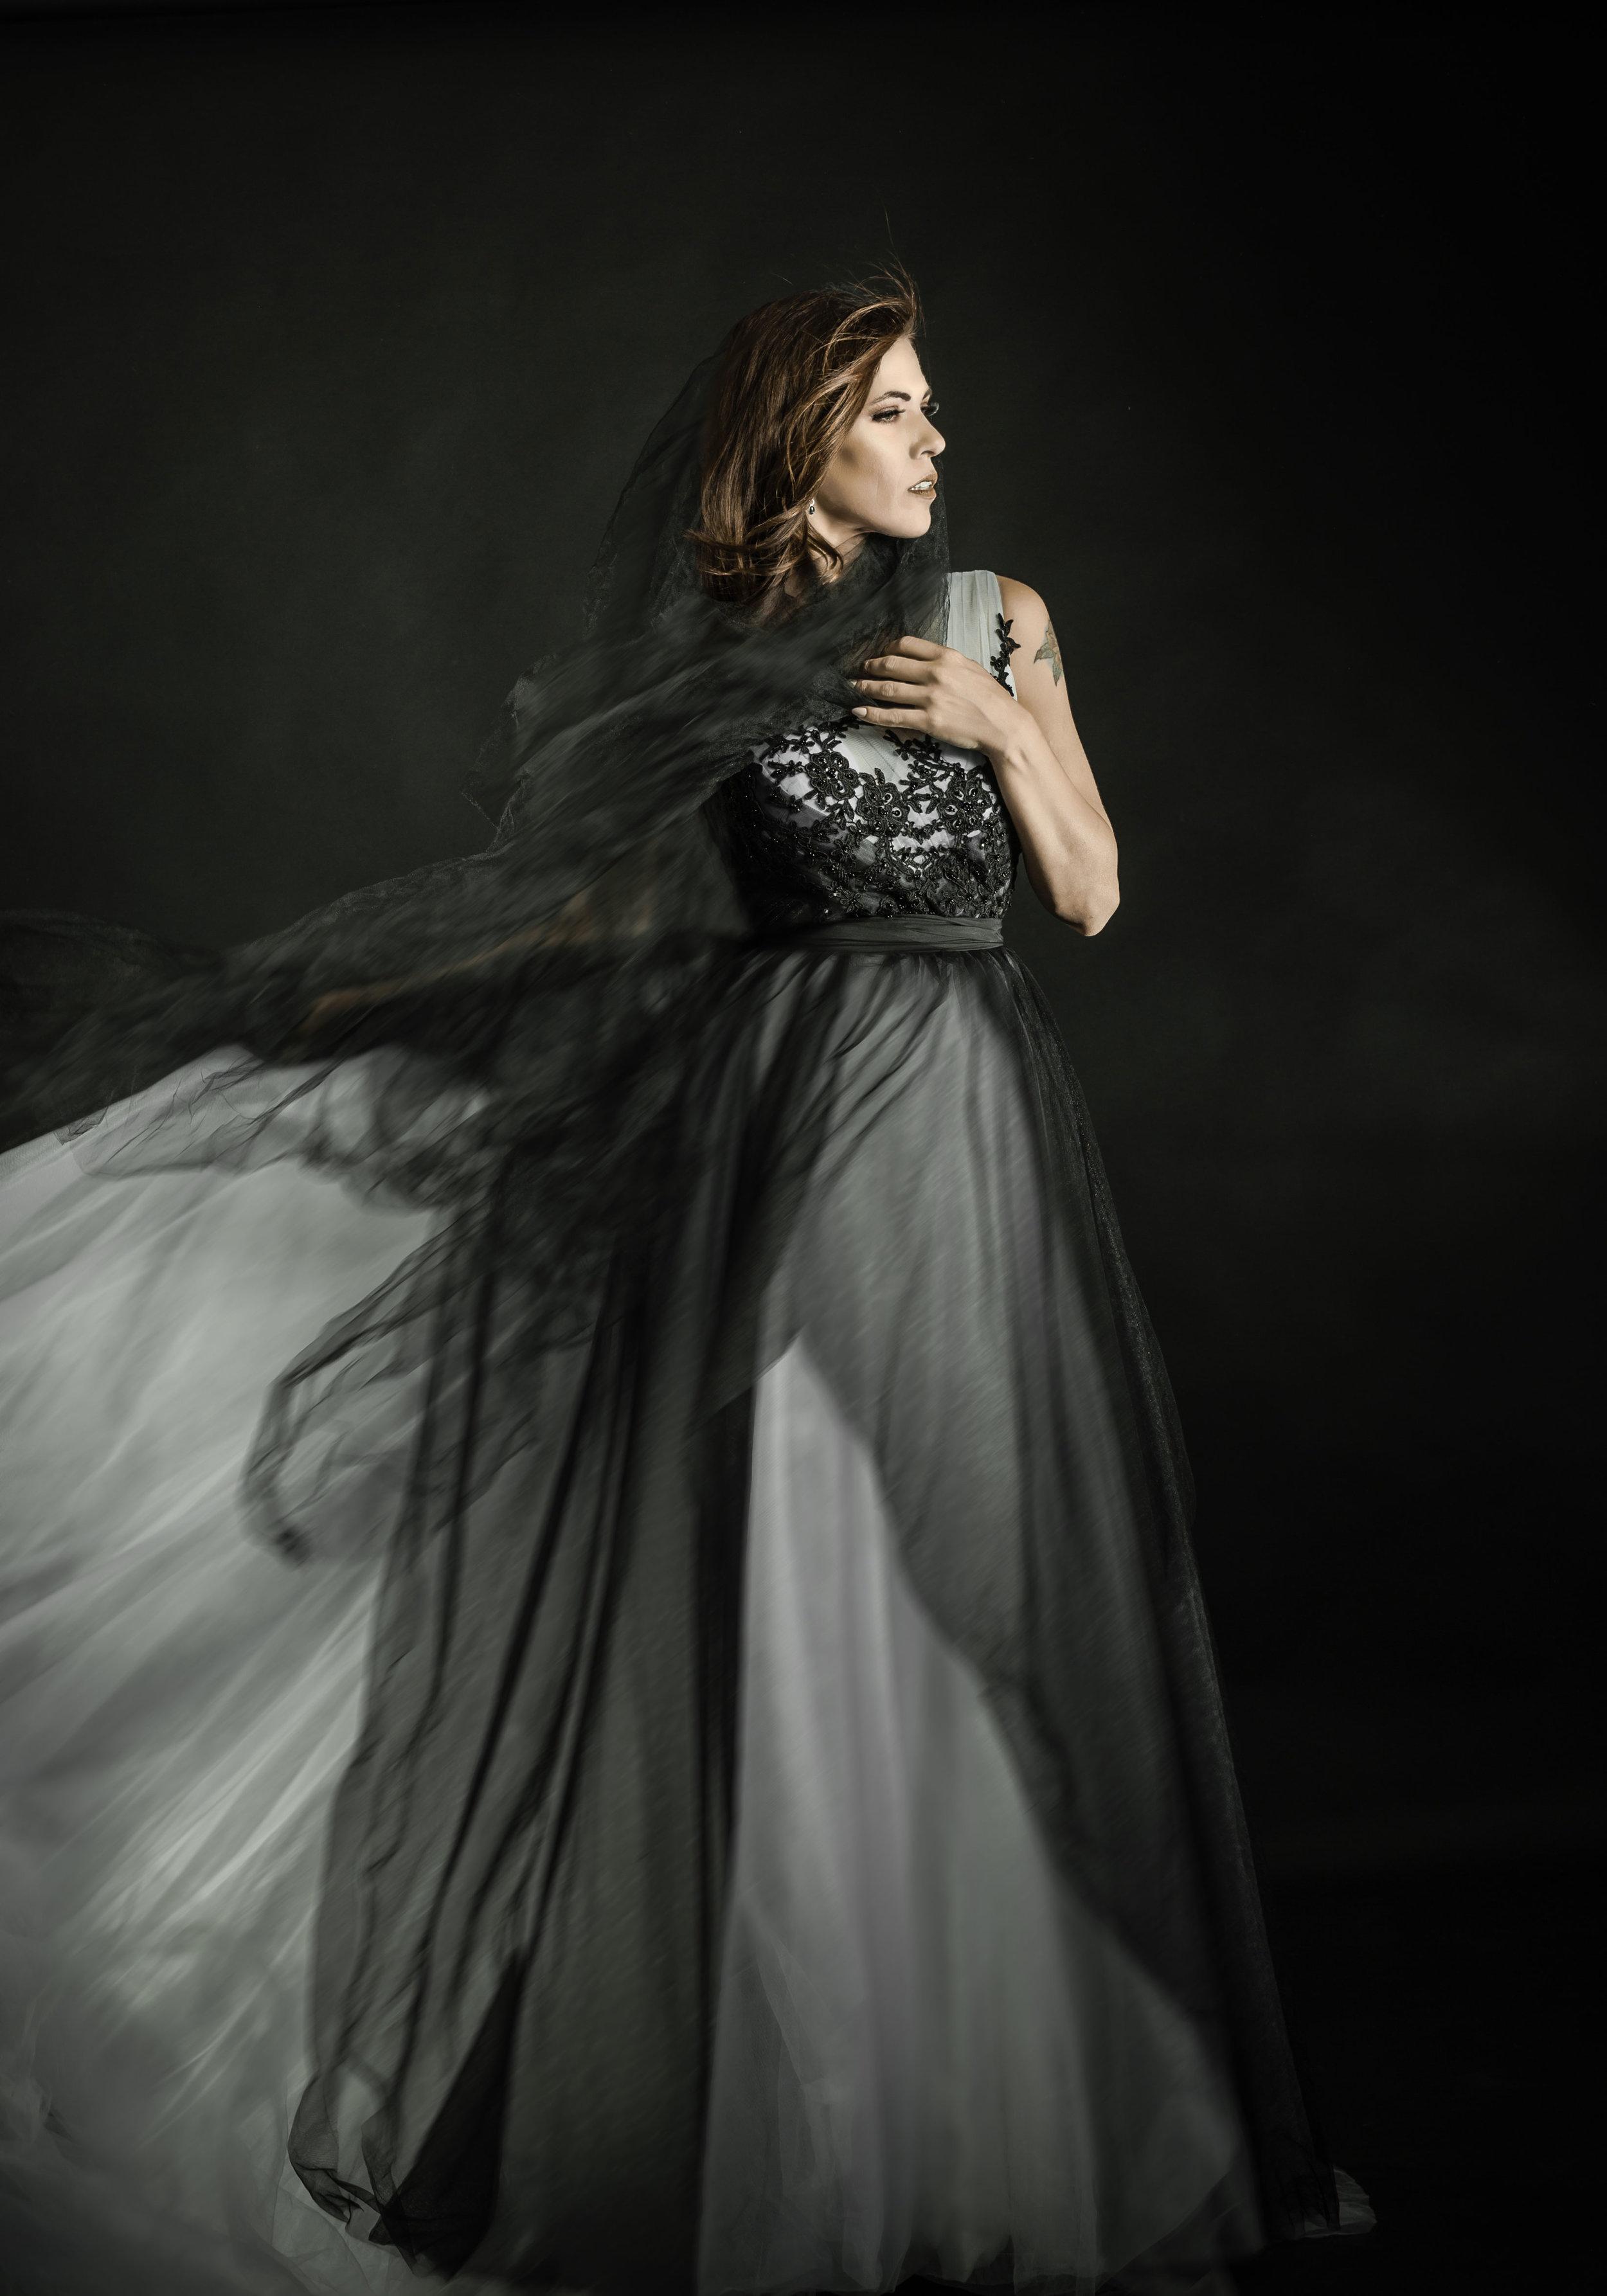 best-portrait-photographer-colorado-springs-Simone-Severo-0028web.jpg